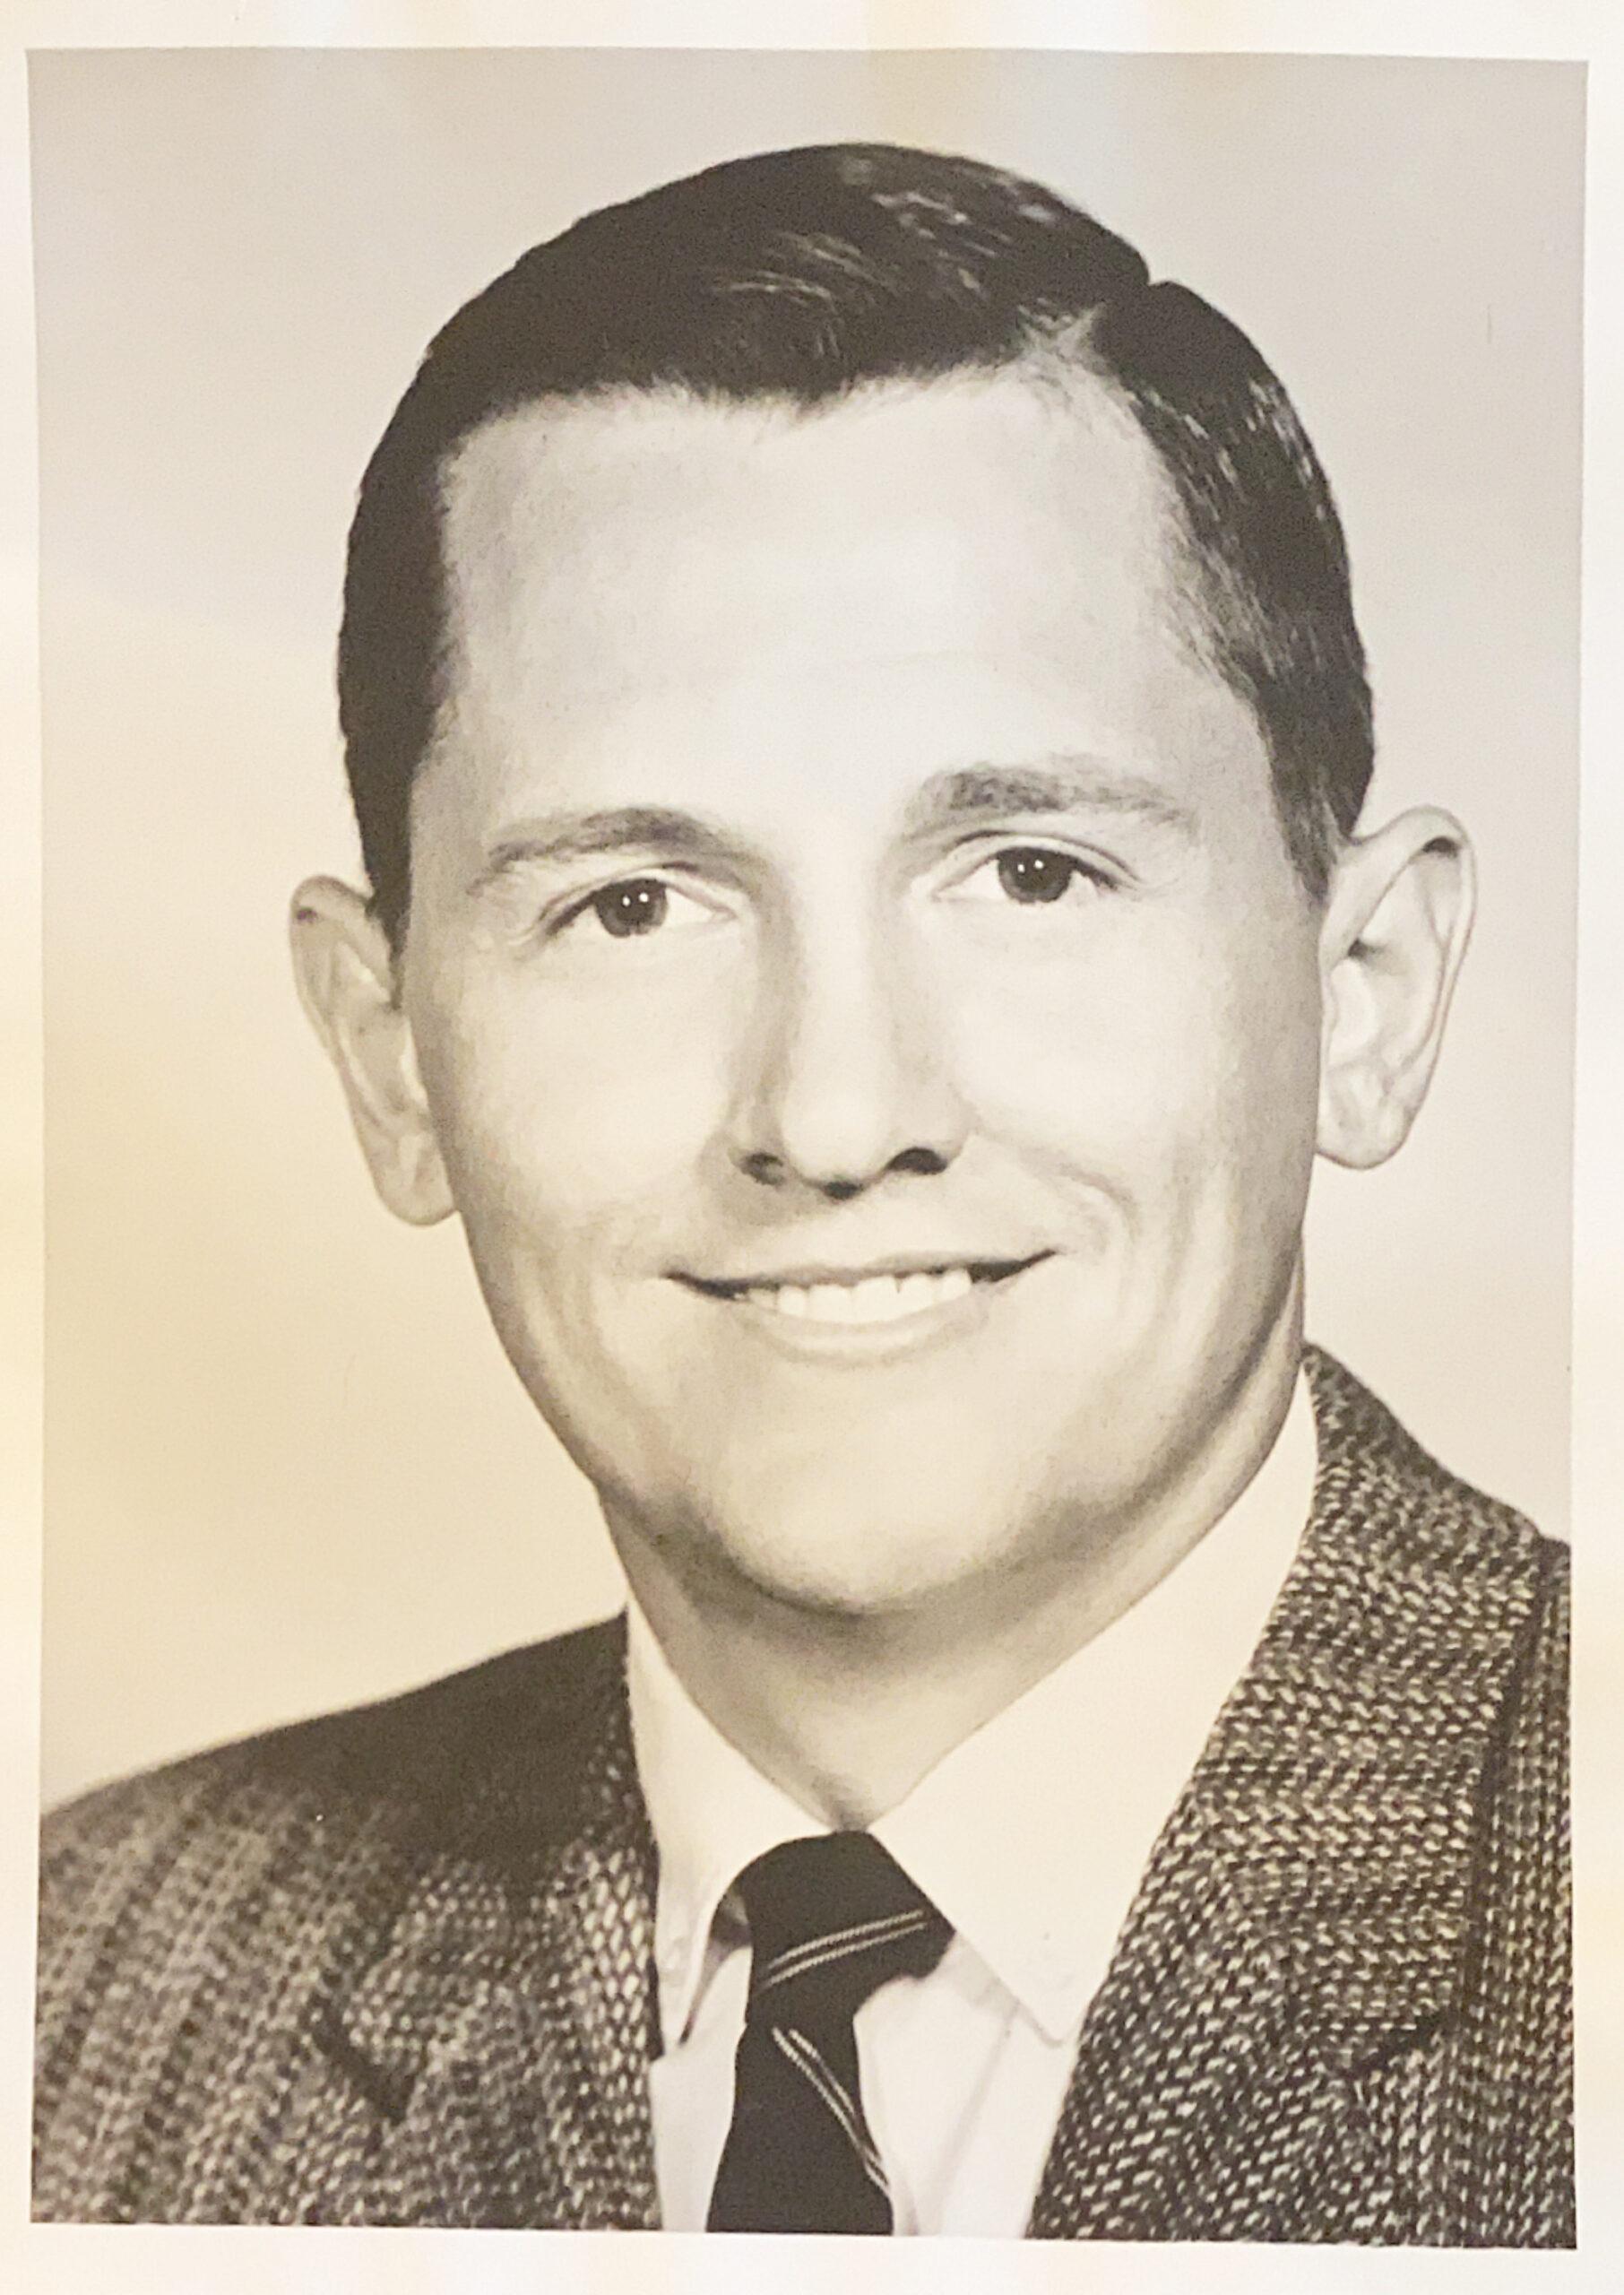 W. Bradford Perkinson